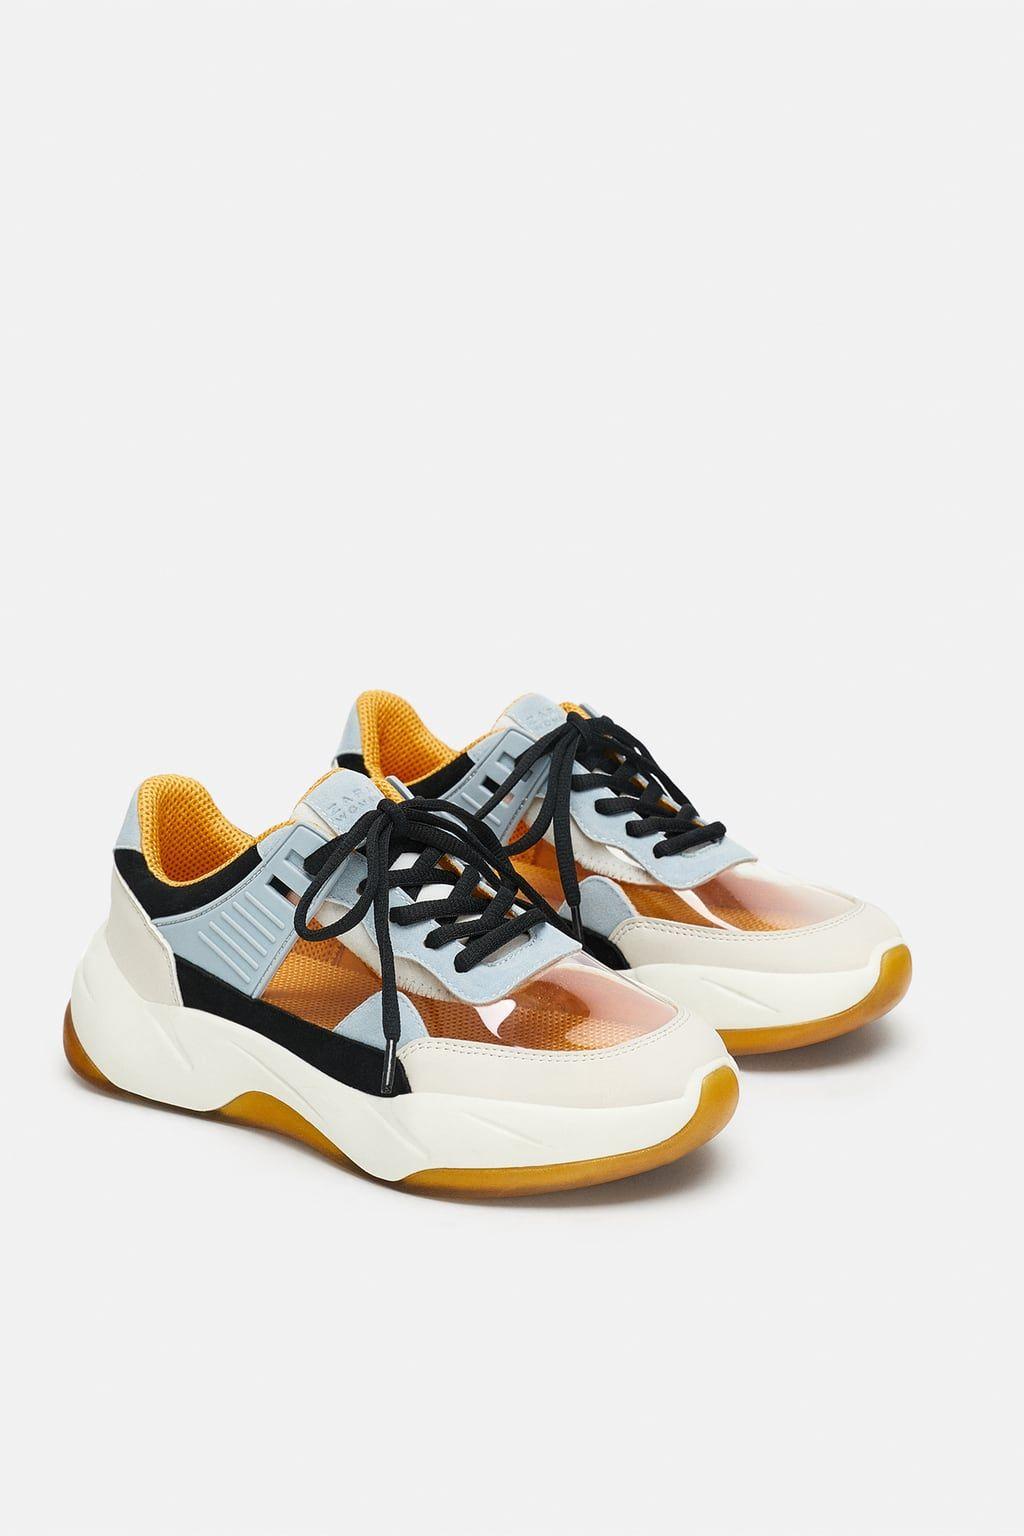 Zara sneakers, Dad shoes, Zara